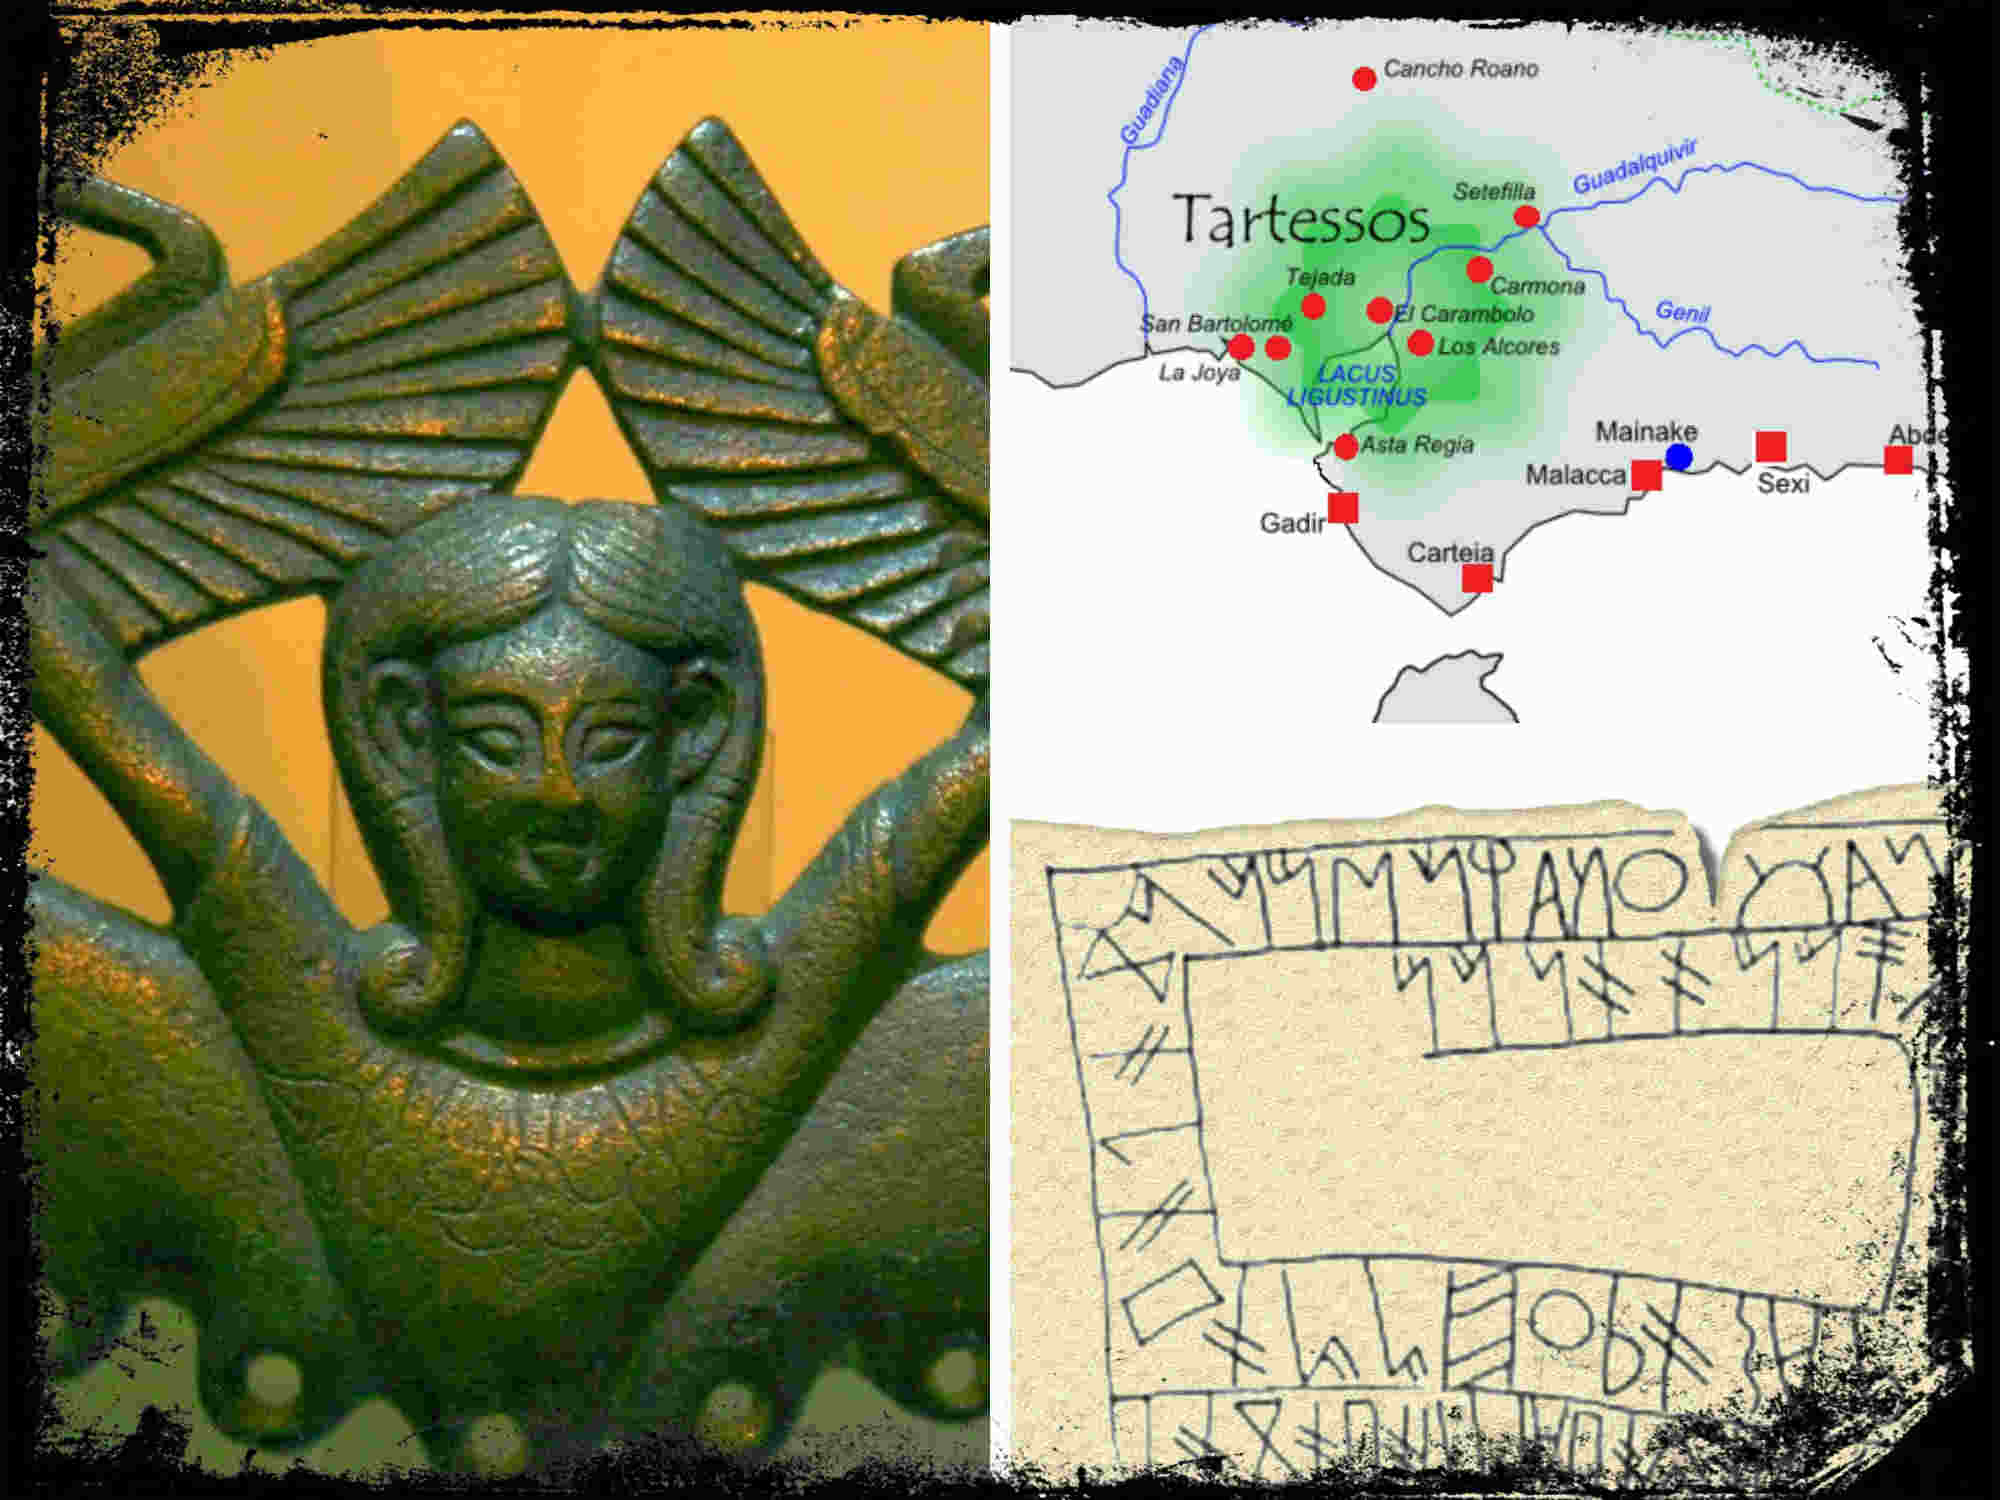 Tartessos, el reino del lejano Occidente